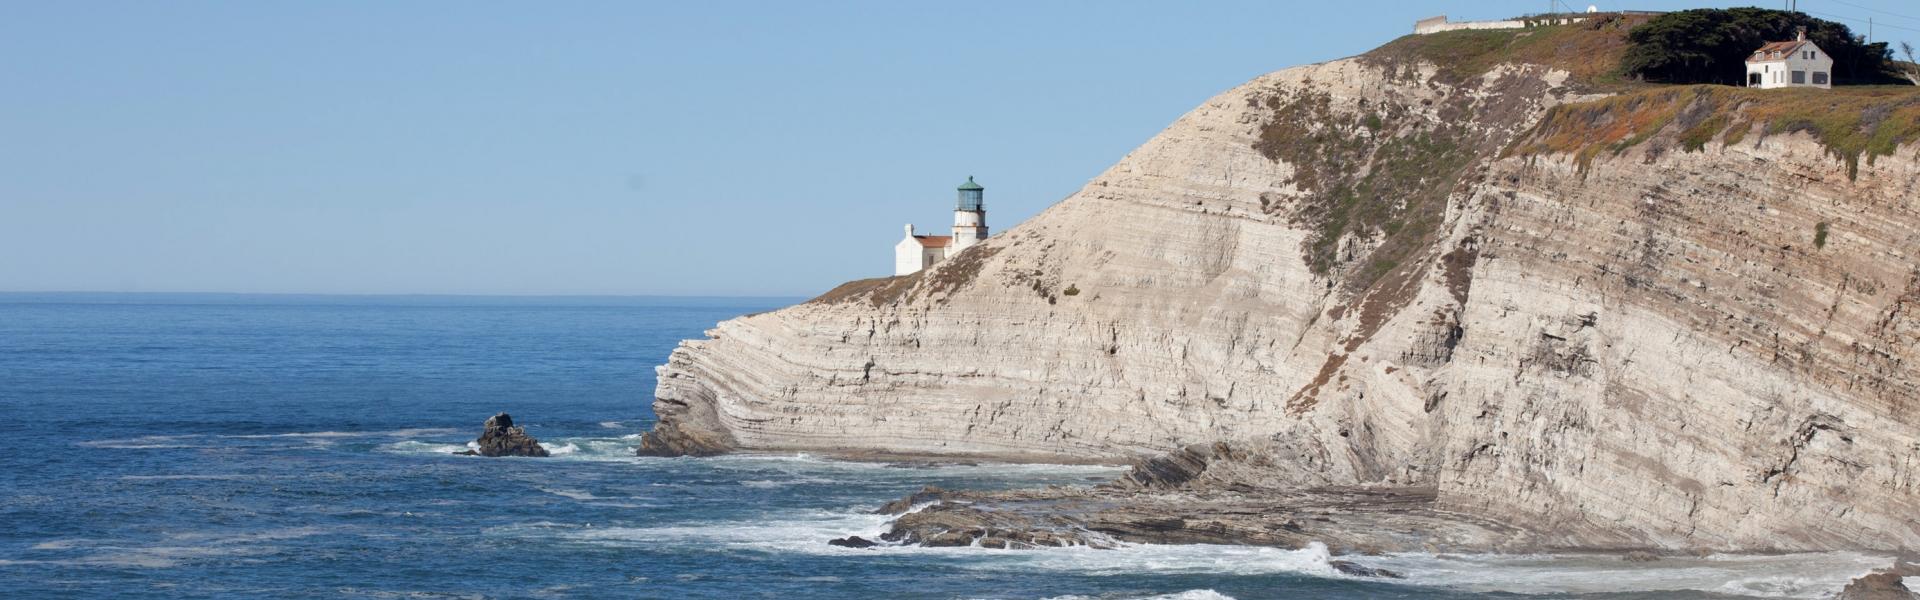 Lighthouse on cliffs overlooking ocean